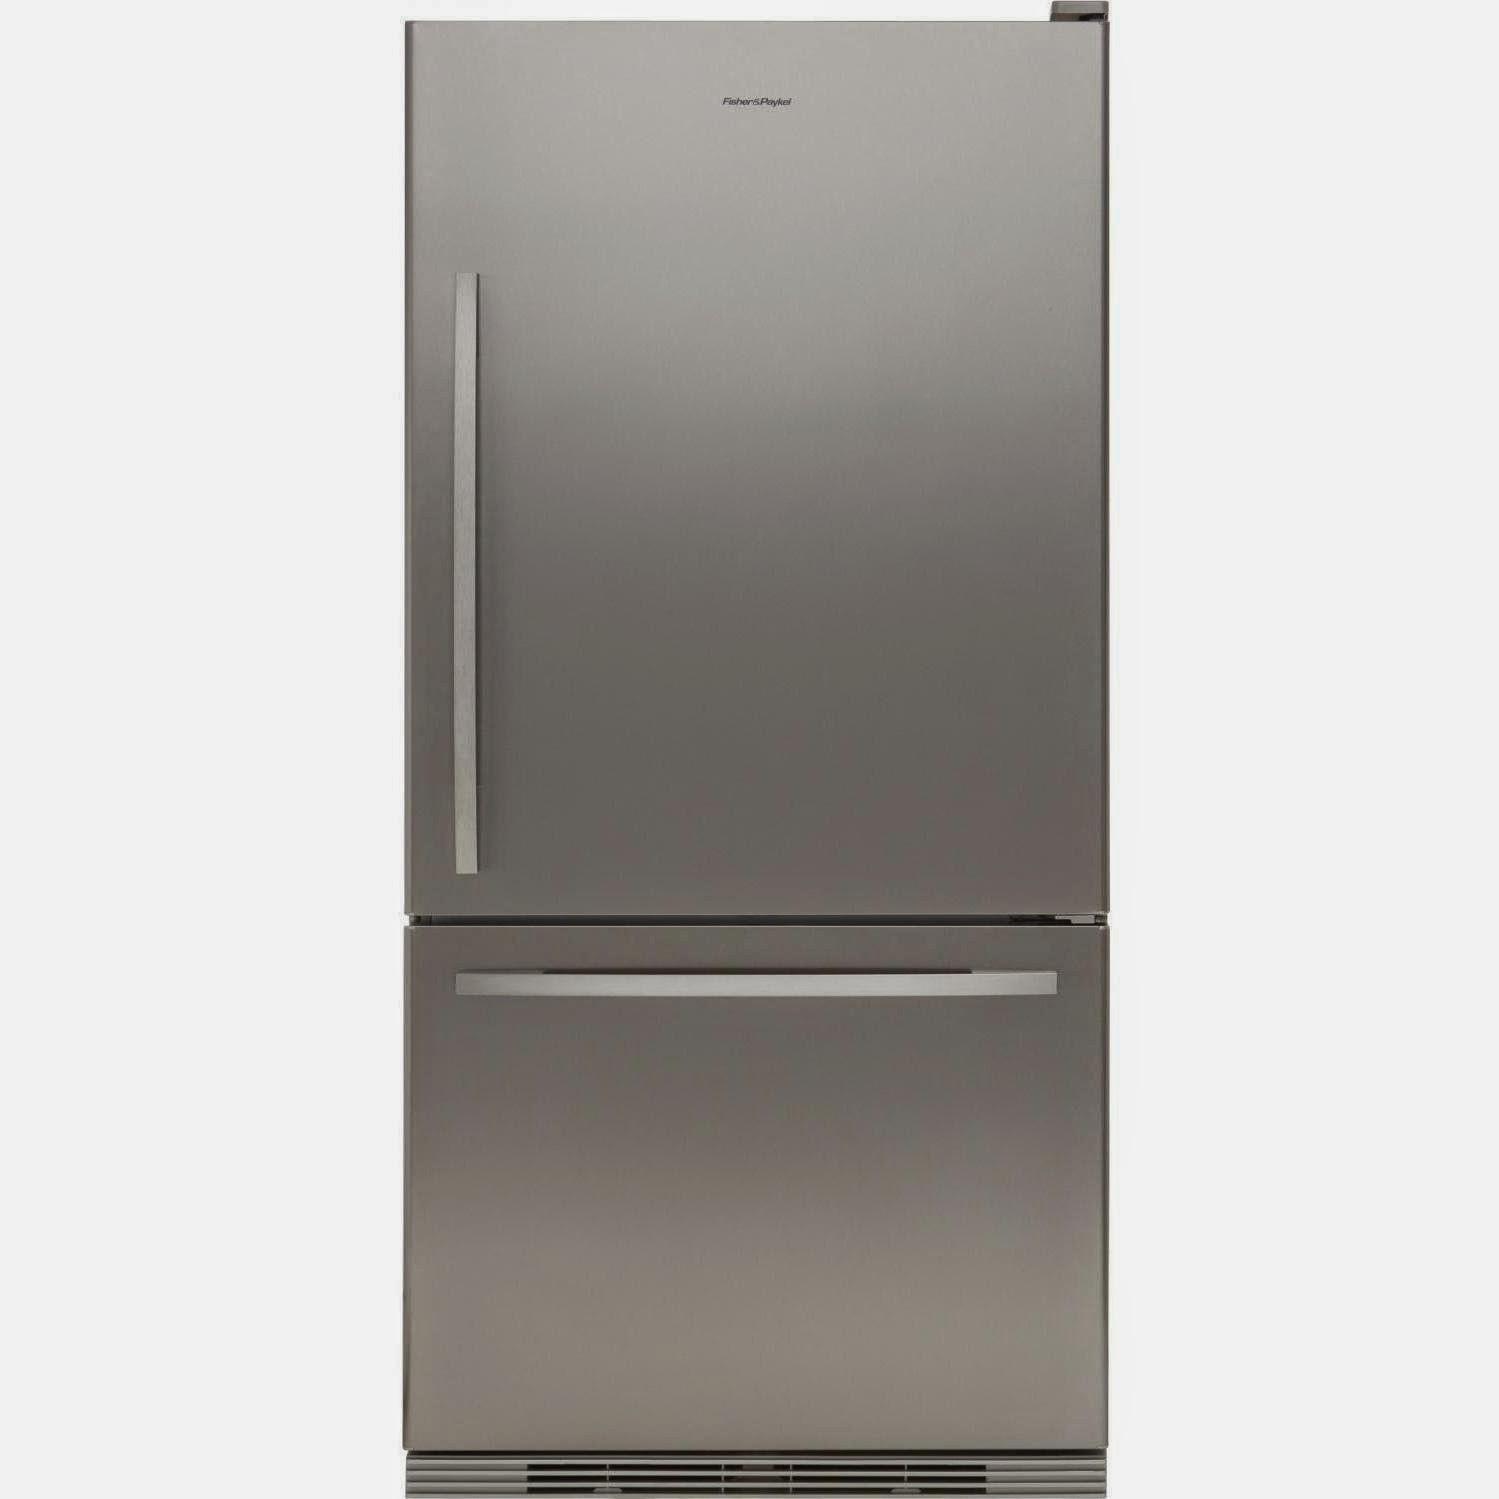 Best Buy Refrigerators On Sale February 2014